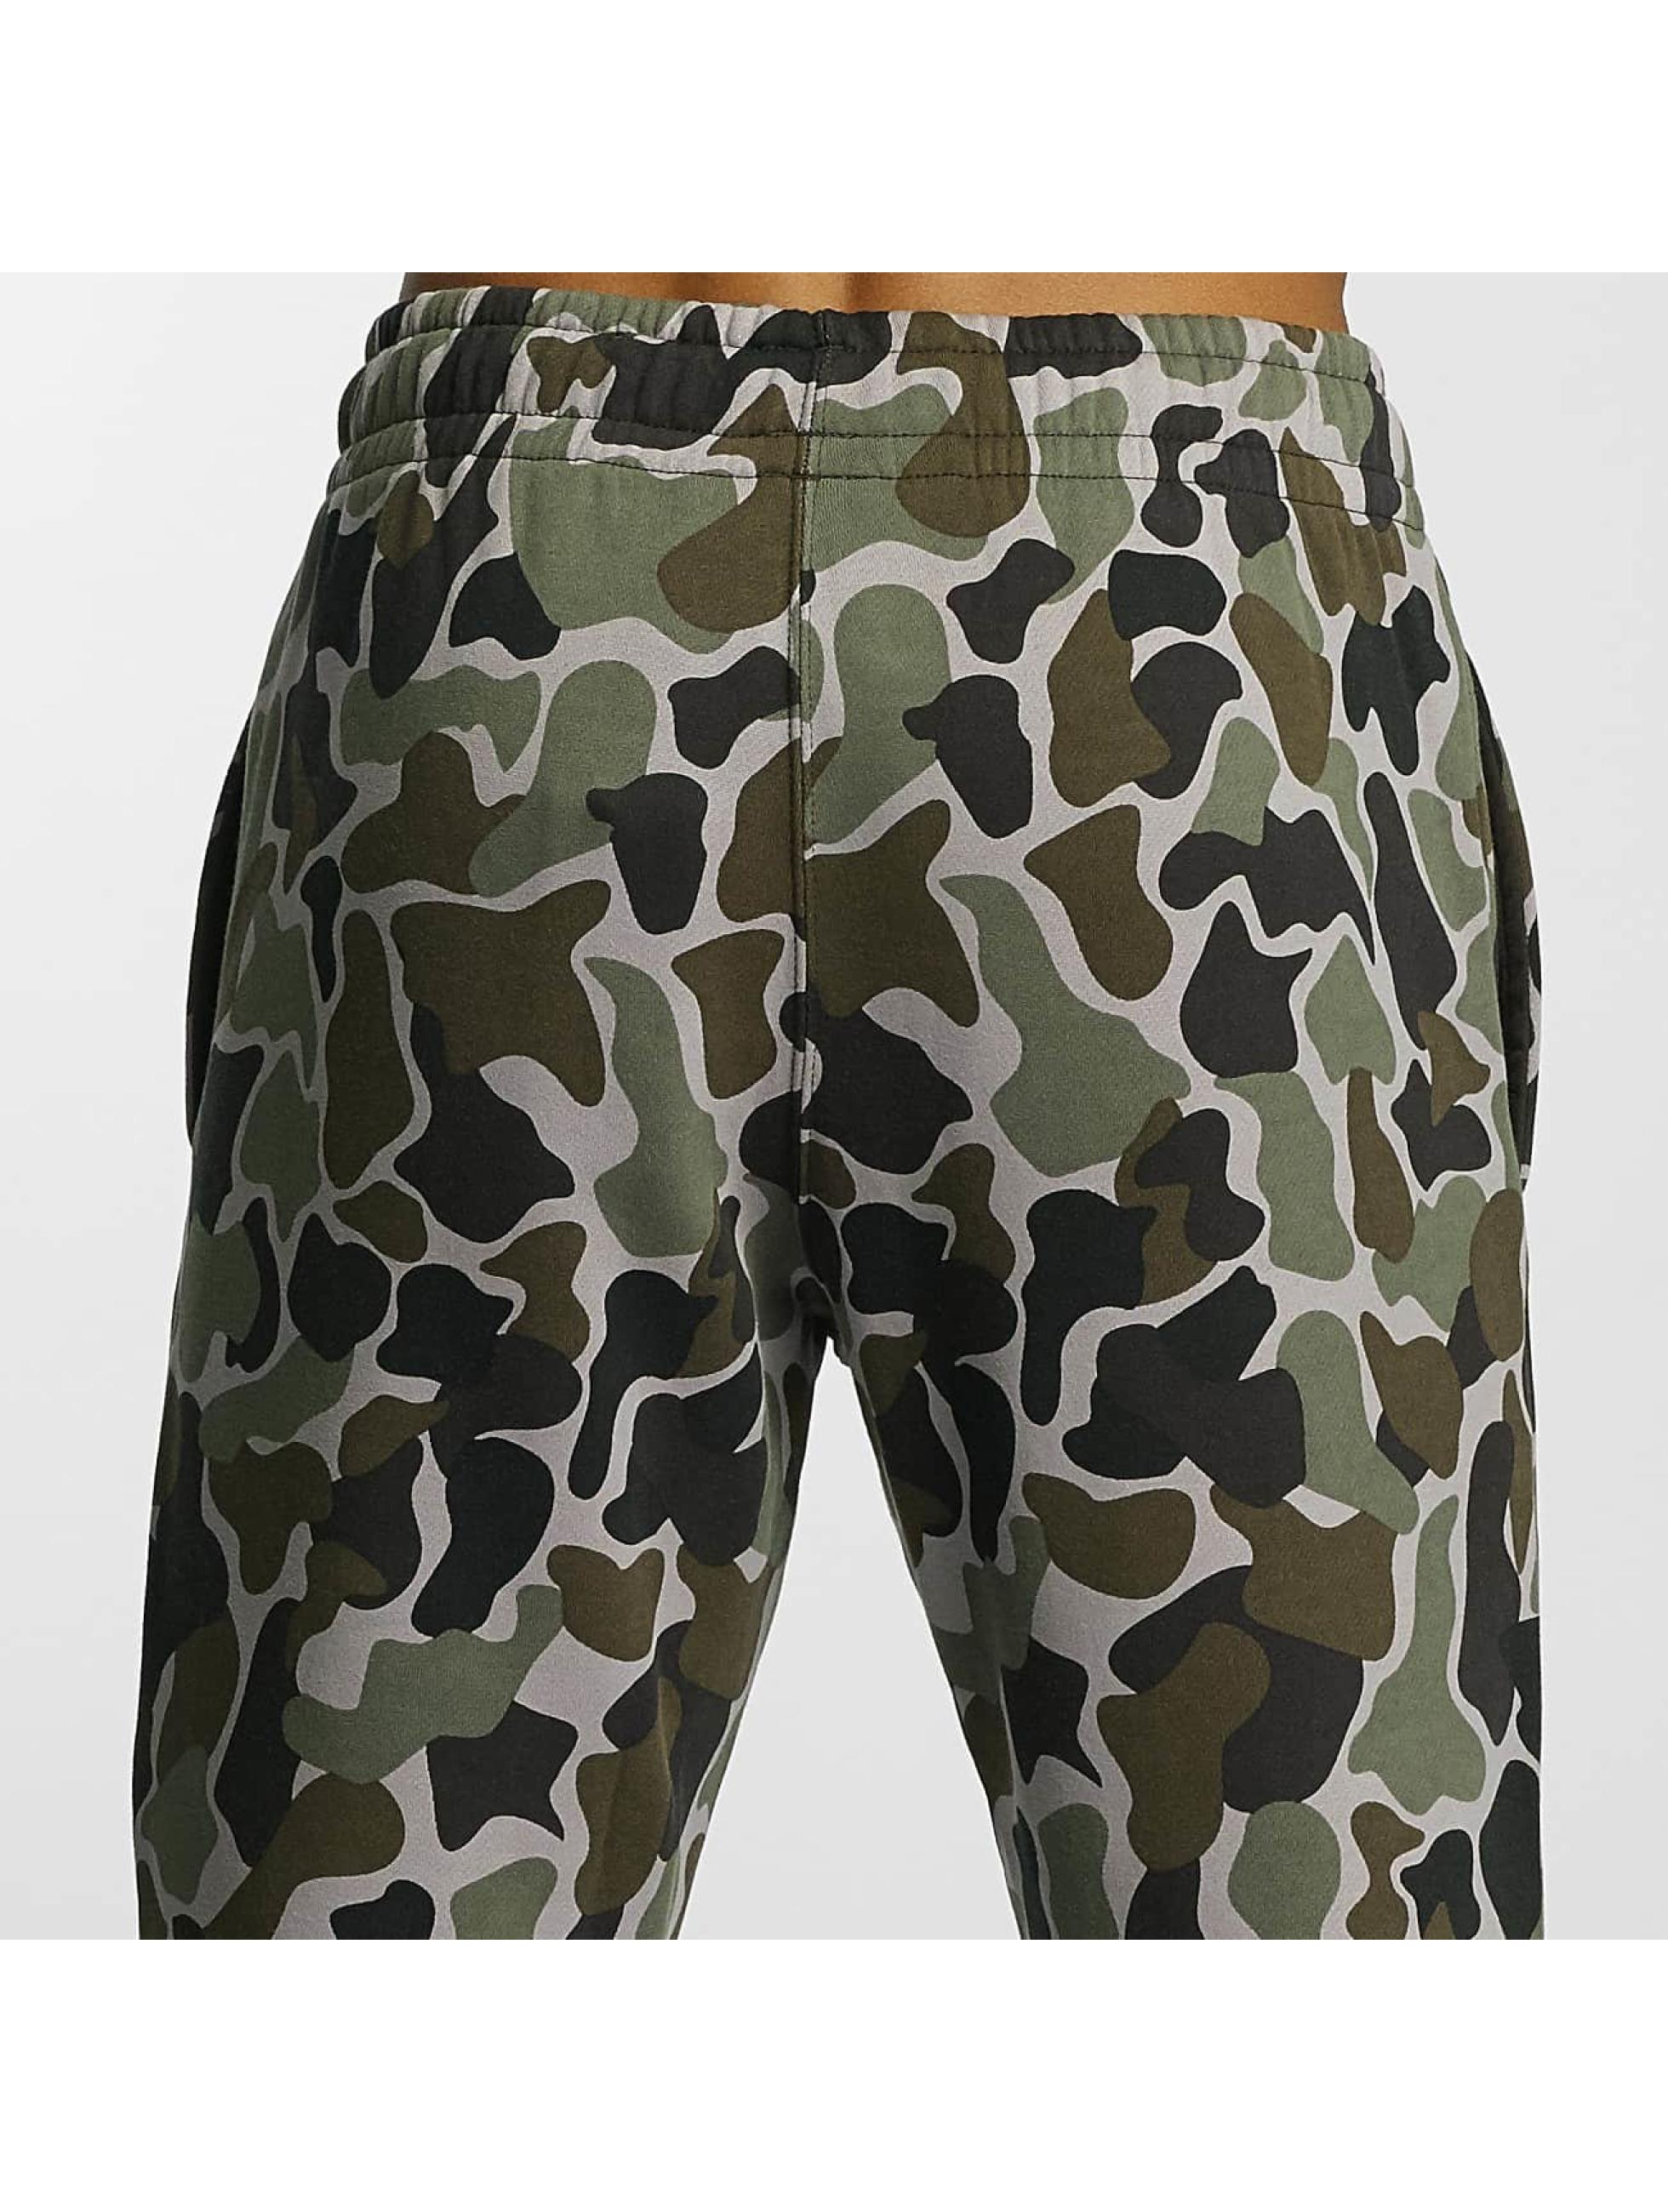 adidas Jogginghose Camo camouflage